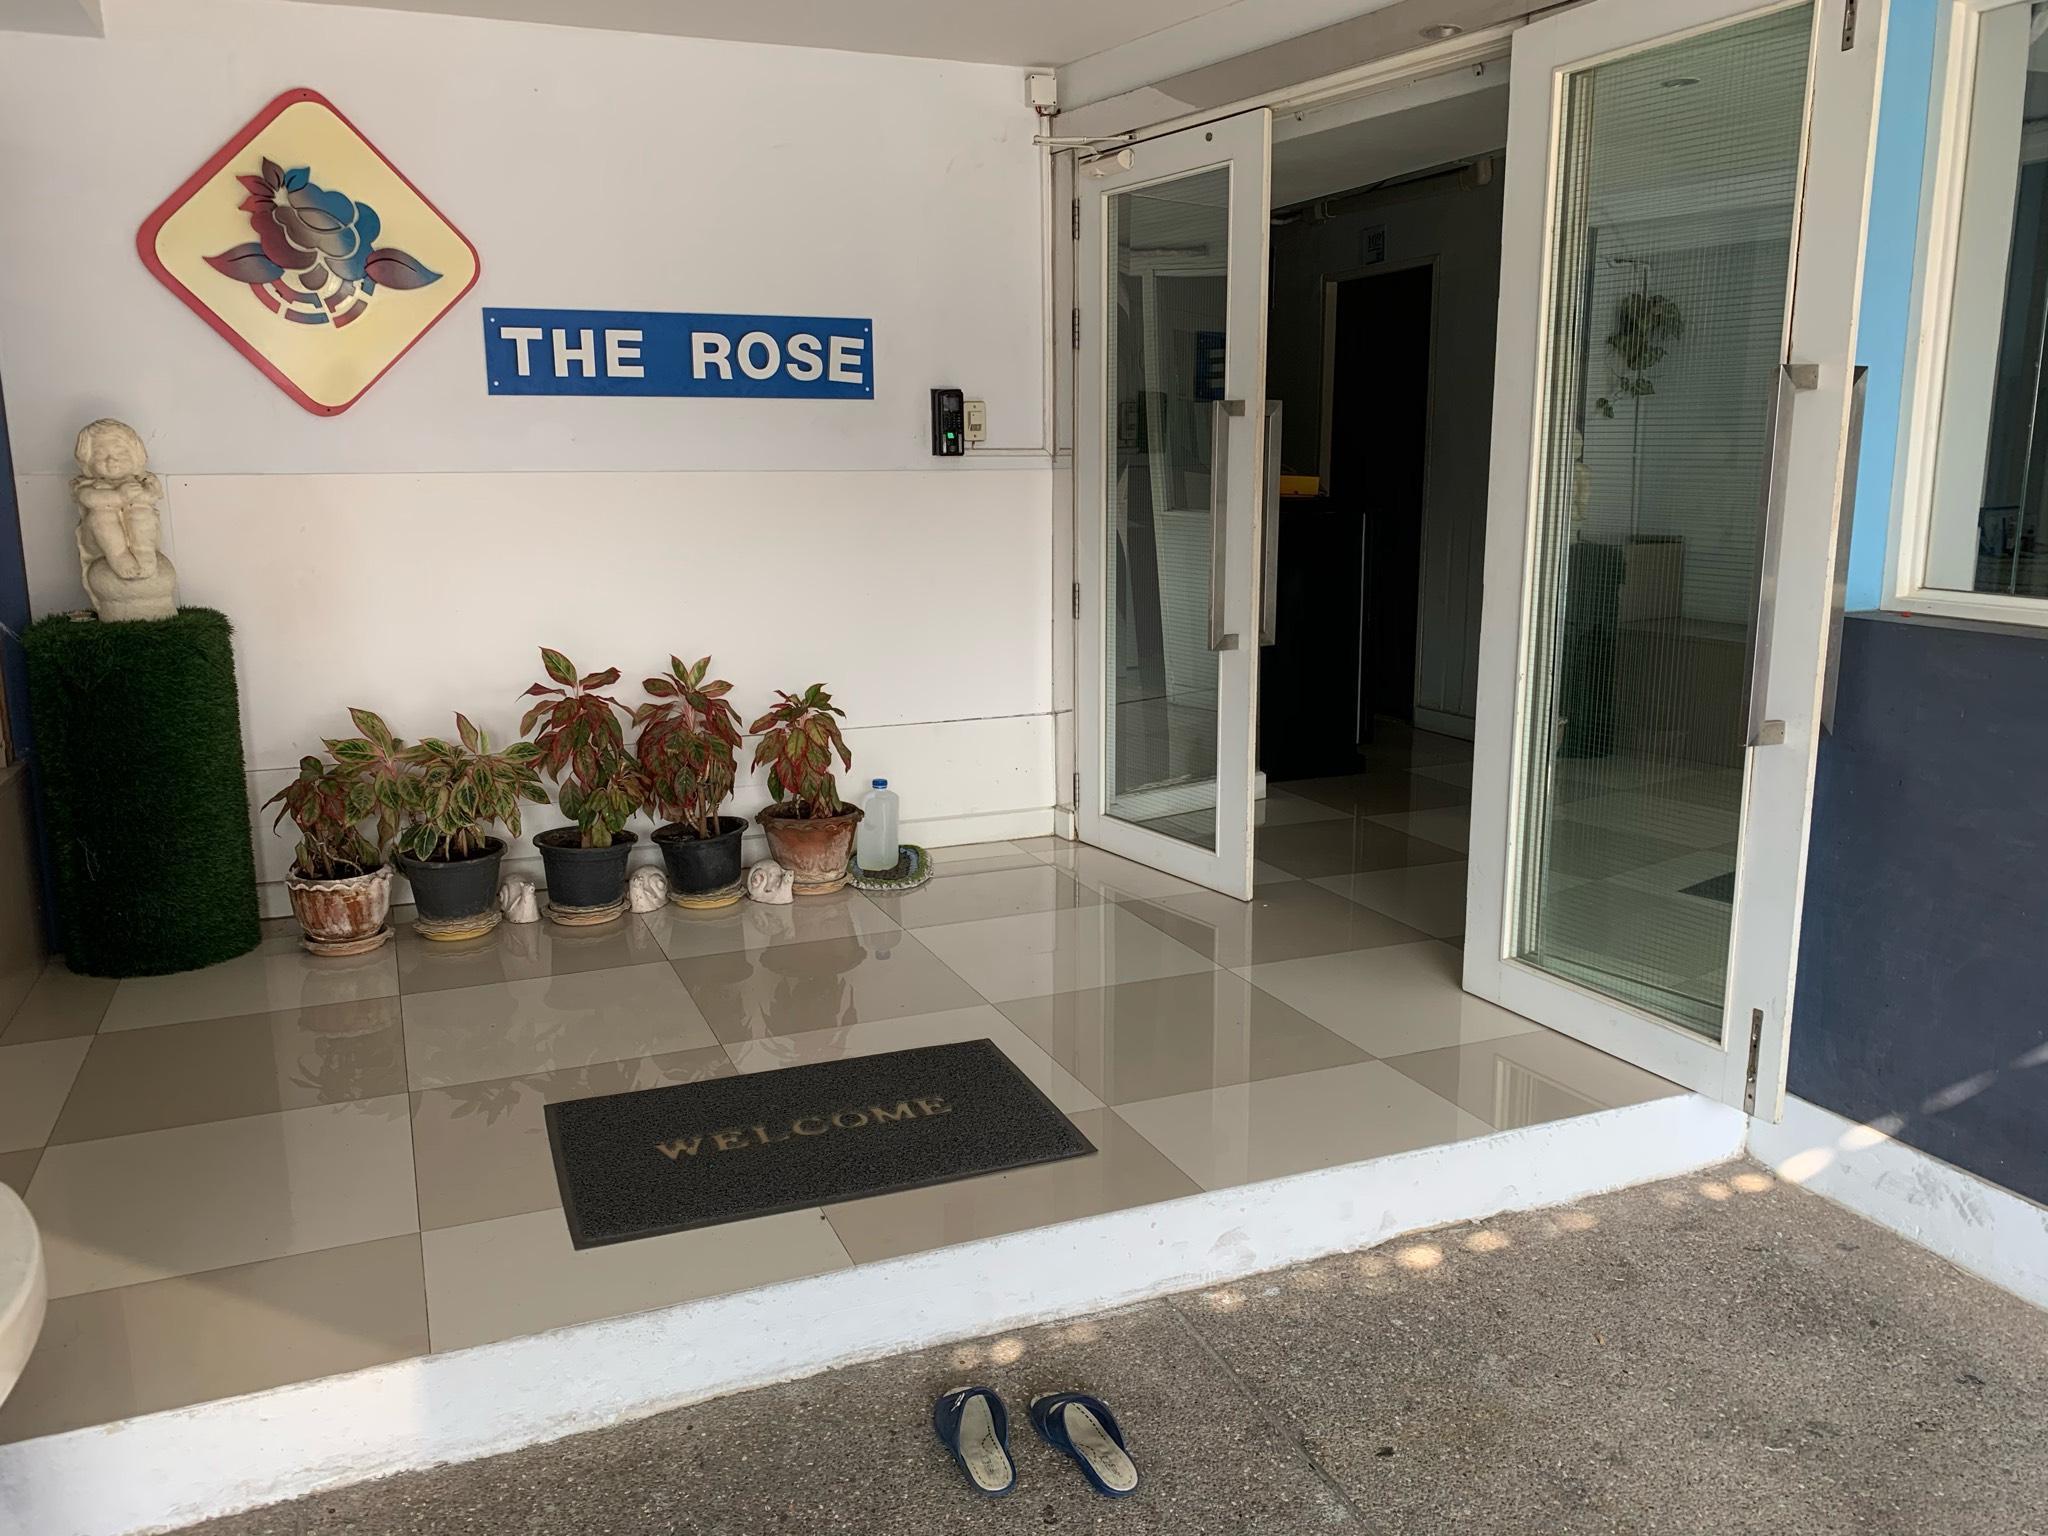 Modest stay at The Rose Apartment สตูดิโอ อพาร์ตเมนต์ 1 ห้องน้ำส่วนตัว ขนาด 24 ตร.ม. – บางนา